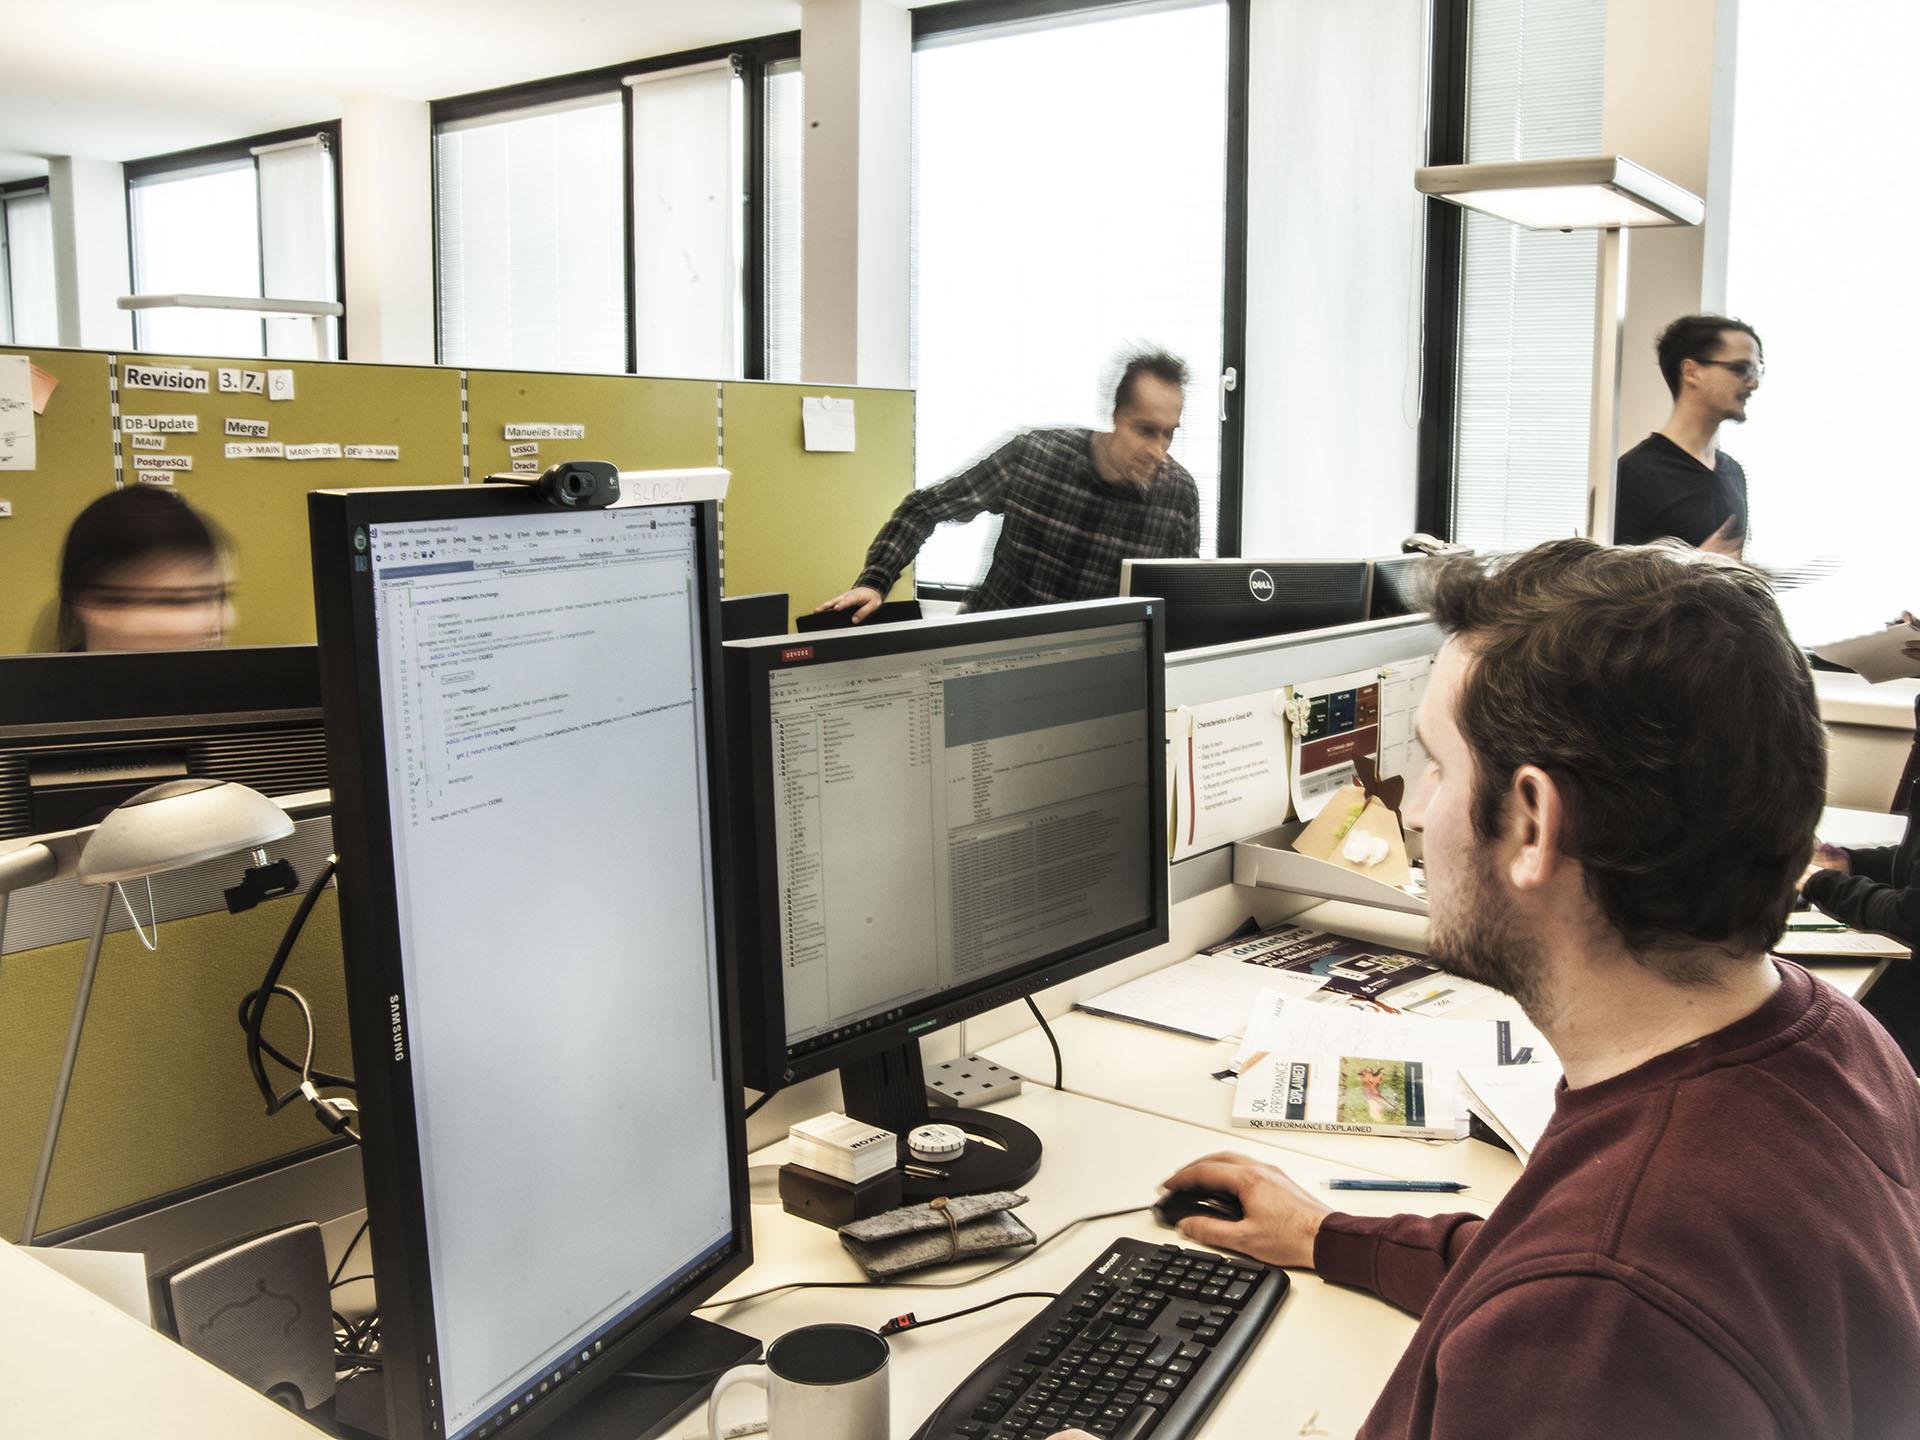 HAKOM Solutions GmbH Wien – Support + Services.